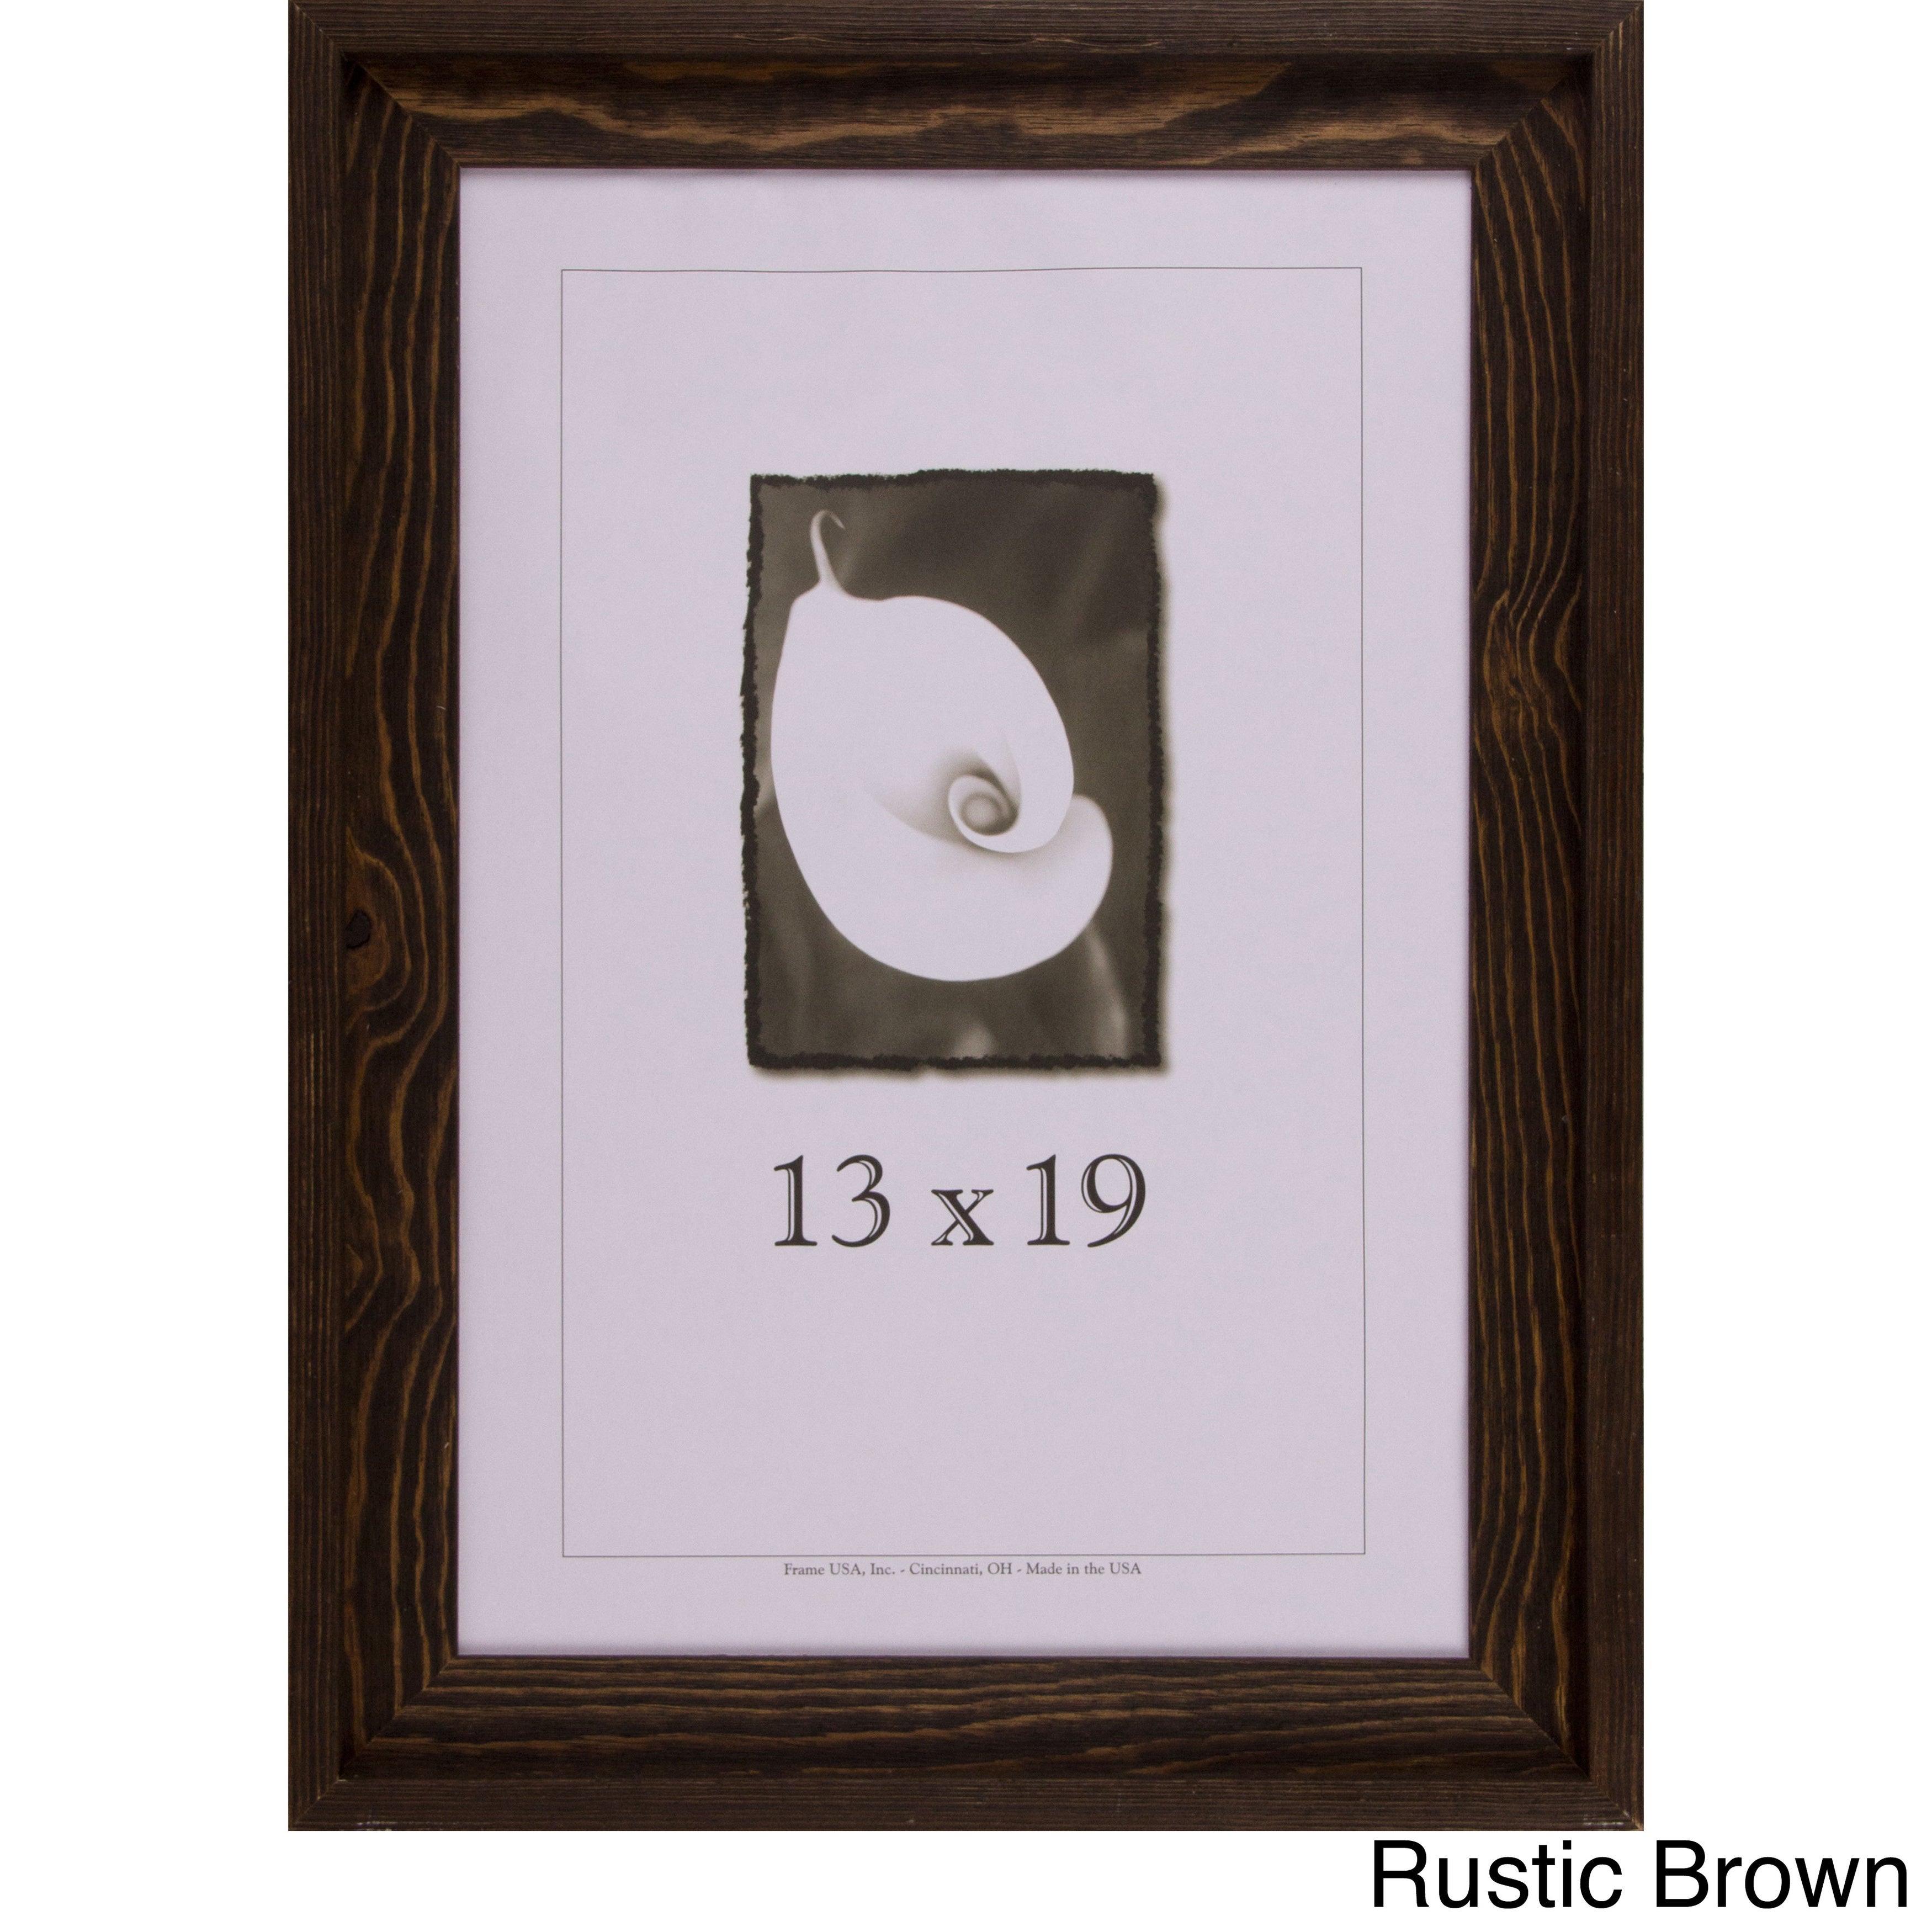 Appalachian Barnwood Picture Frame 13x19 Rustic Brown 13x19 | eBay